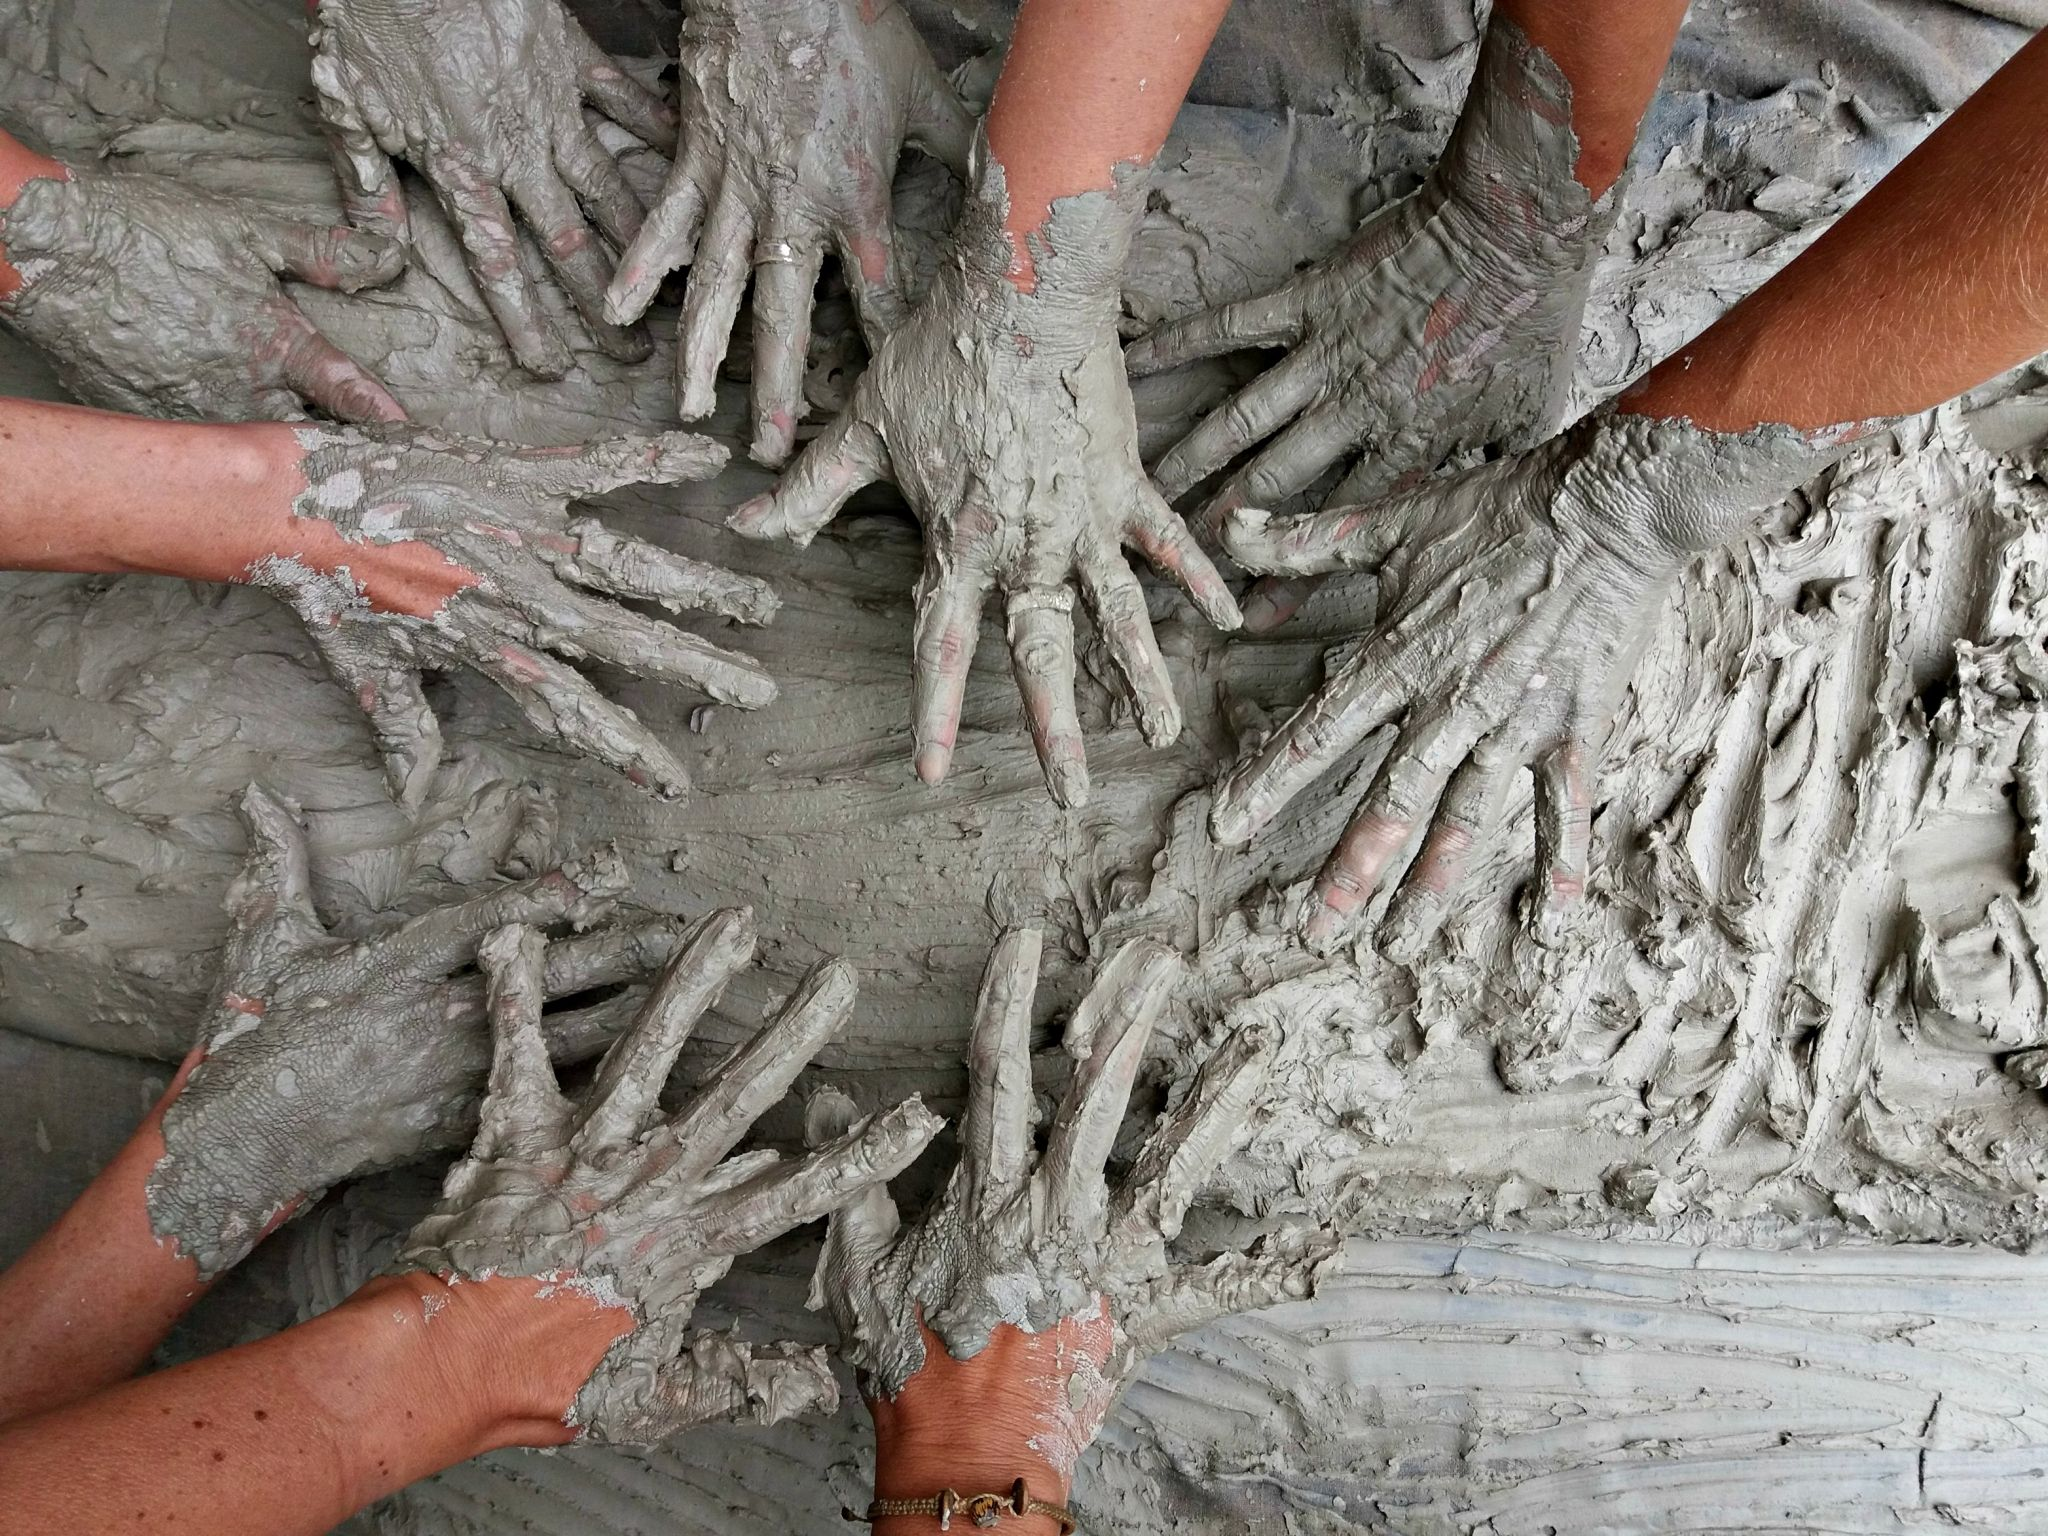 half term fun - play with clay